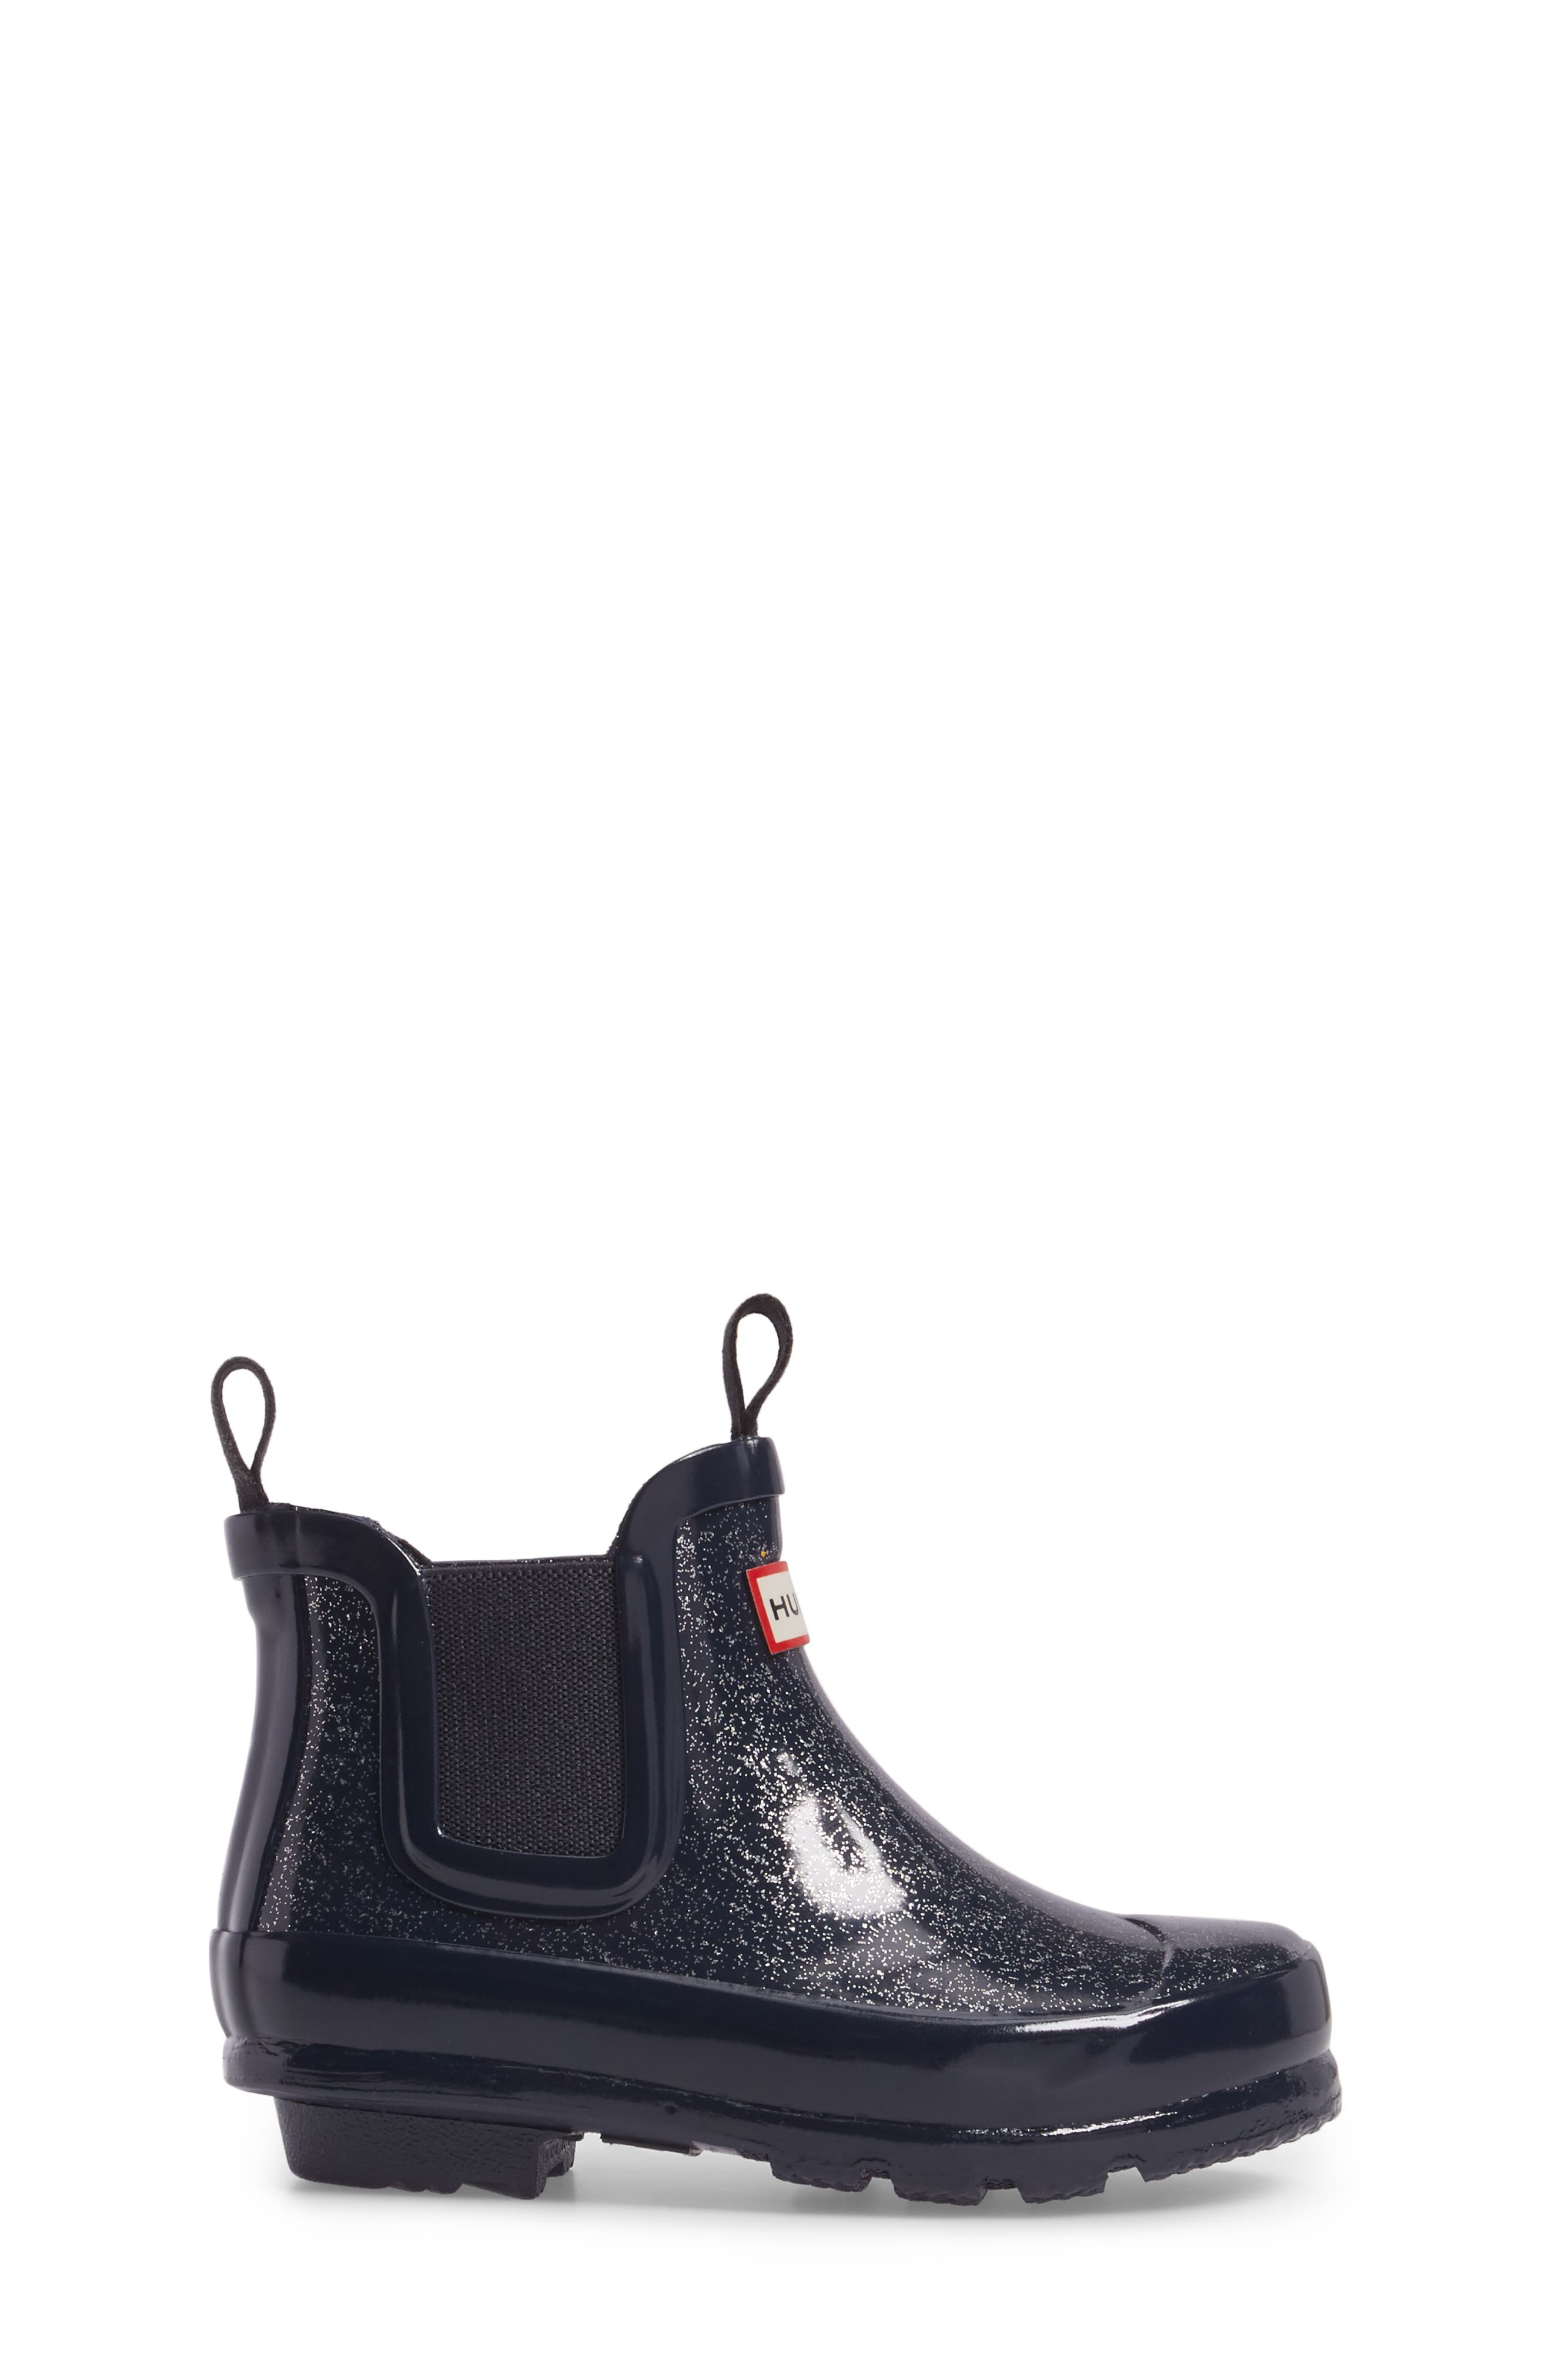 Alternate Image 3  - Hunter Originals Glittery Waterproof Chelsea Boot (Toddler)